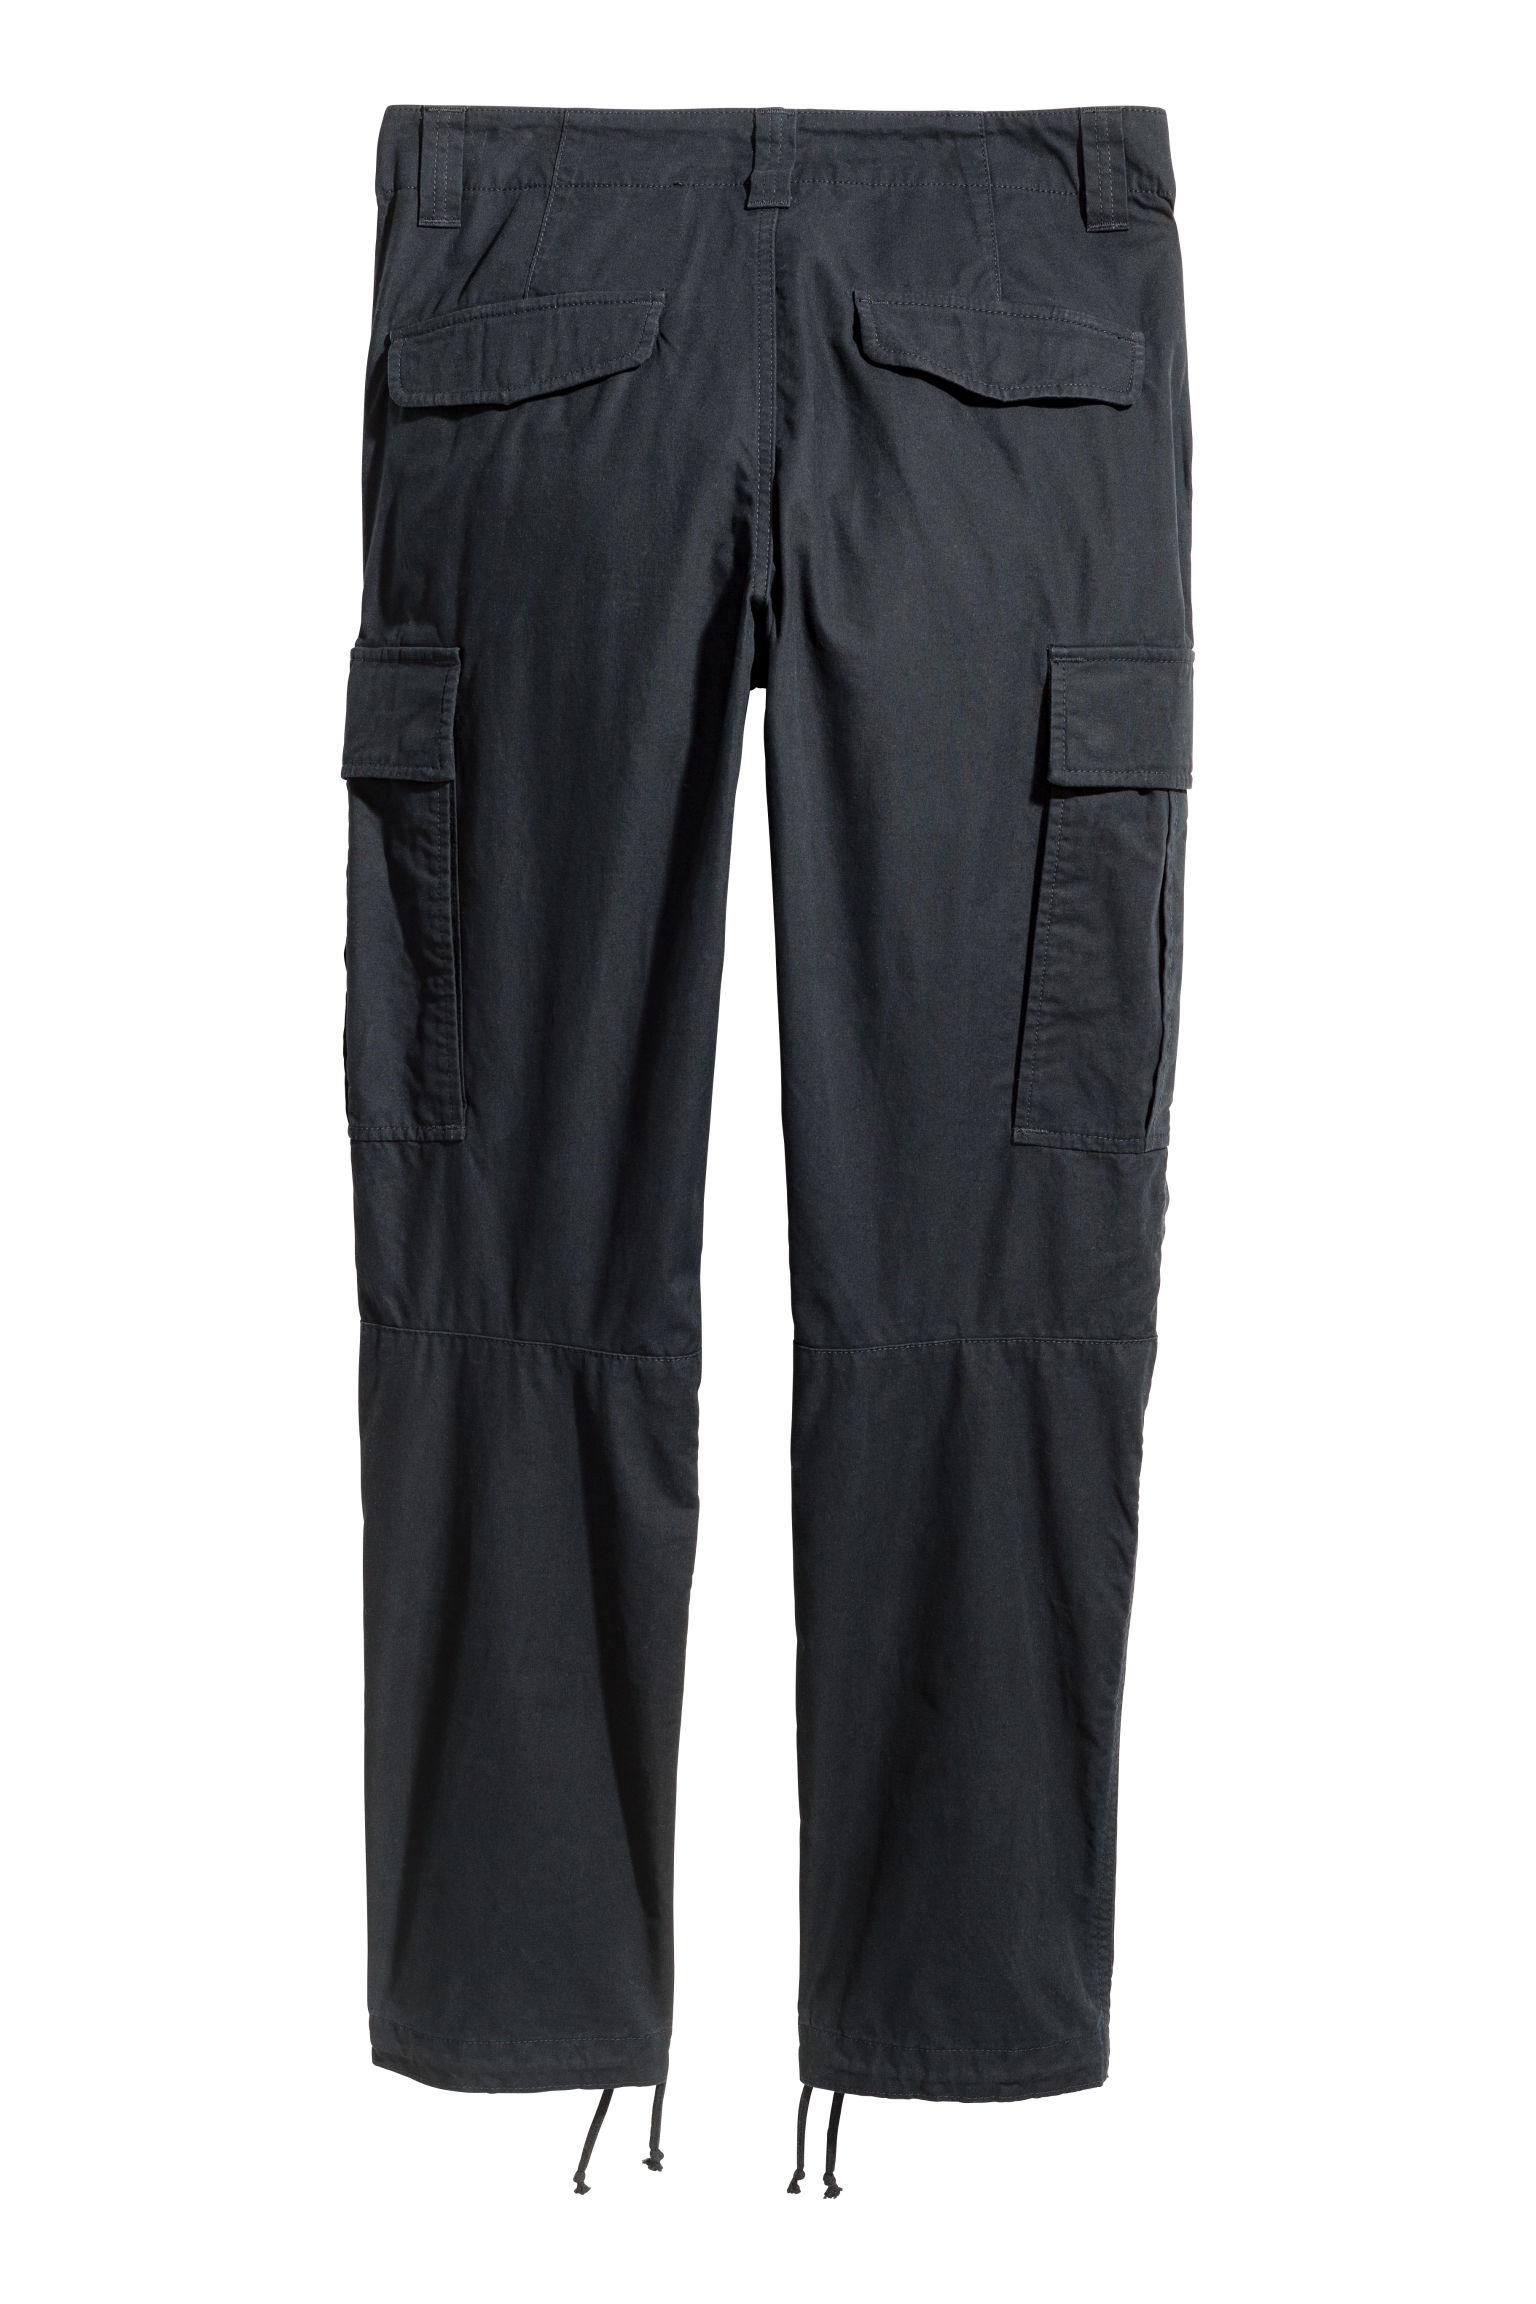 260b5e42473cab Cargo Pants - Black - Men | H&M US